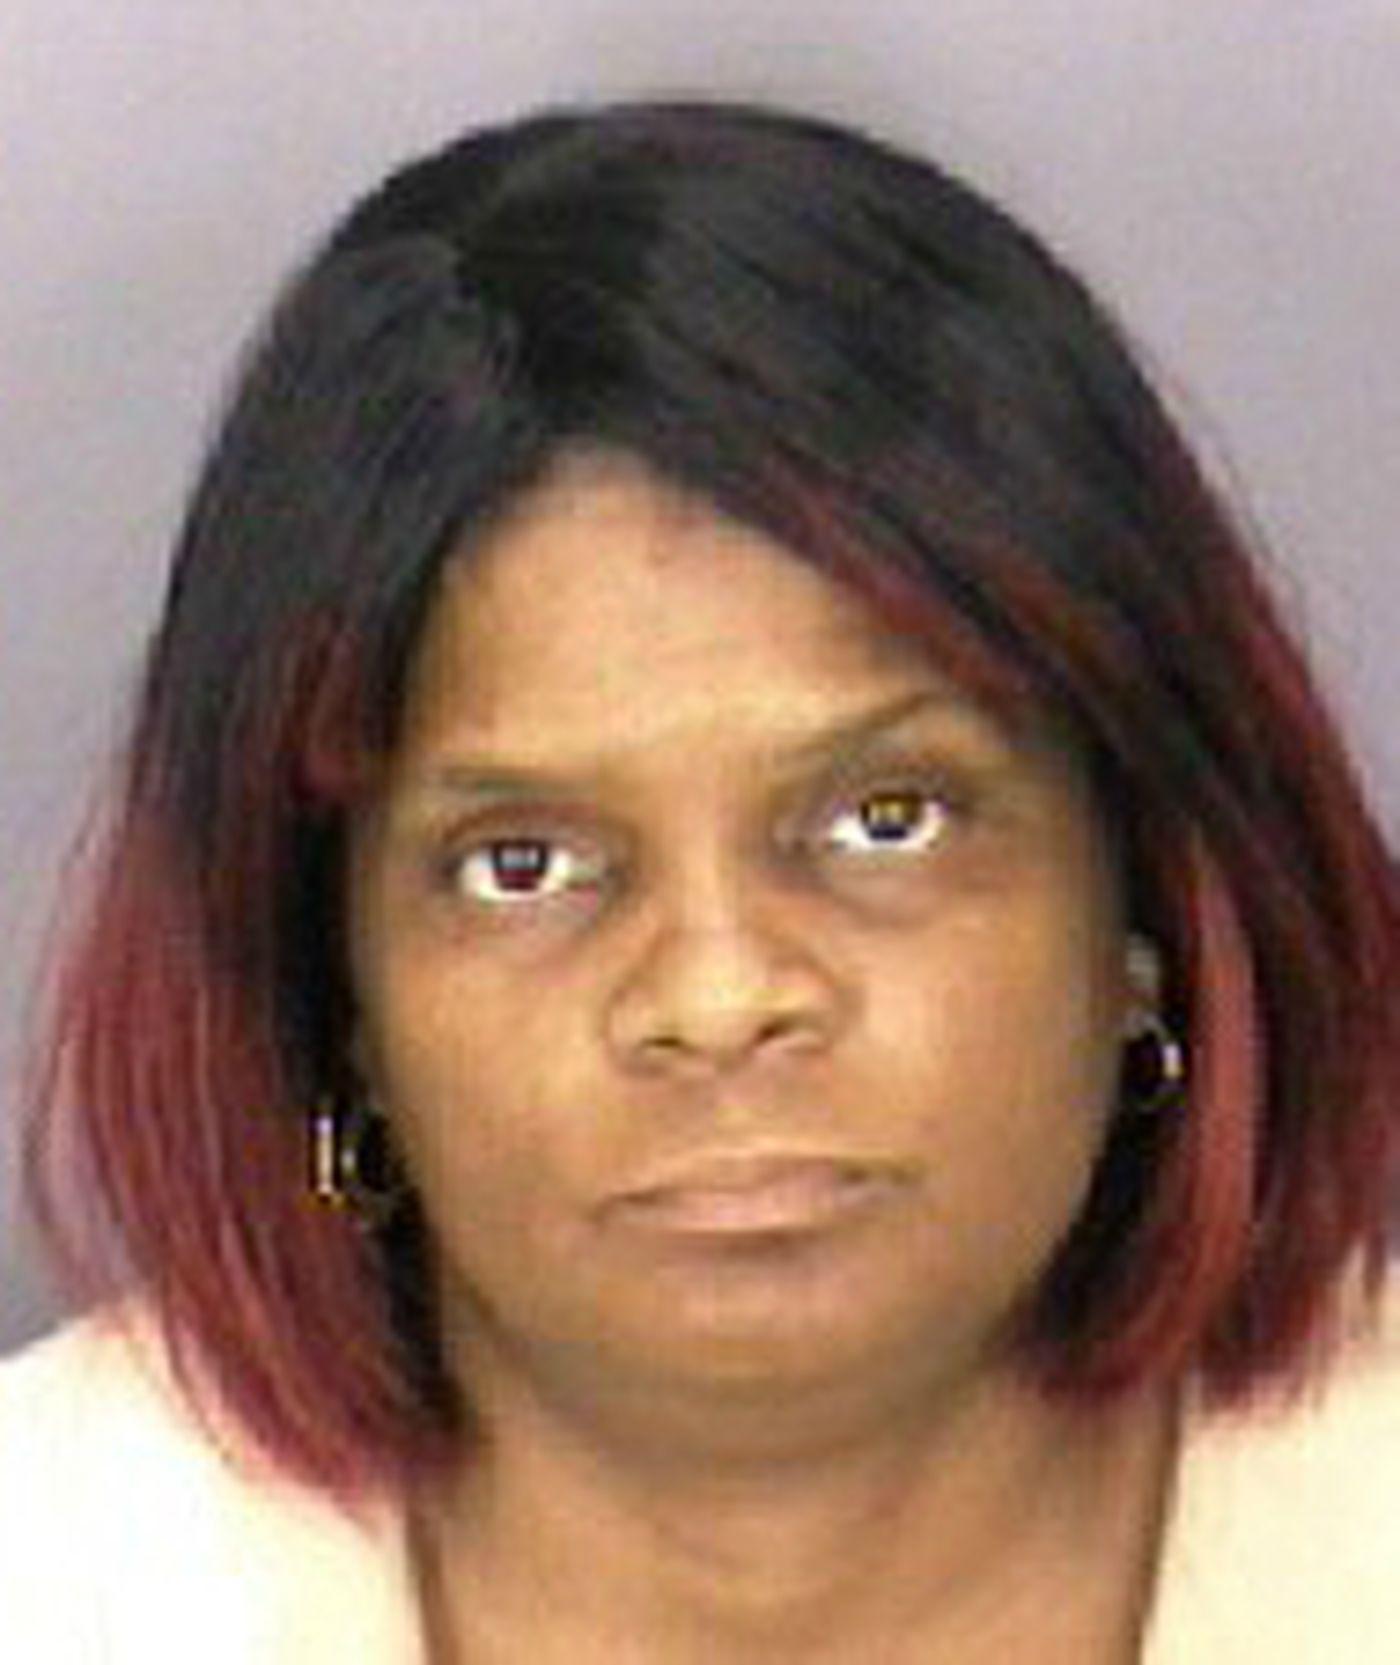 Gloria Byars in a police mug shot when she was arrested in Virginia in 2003.